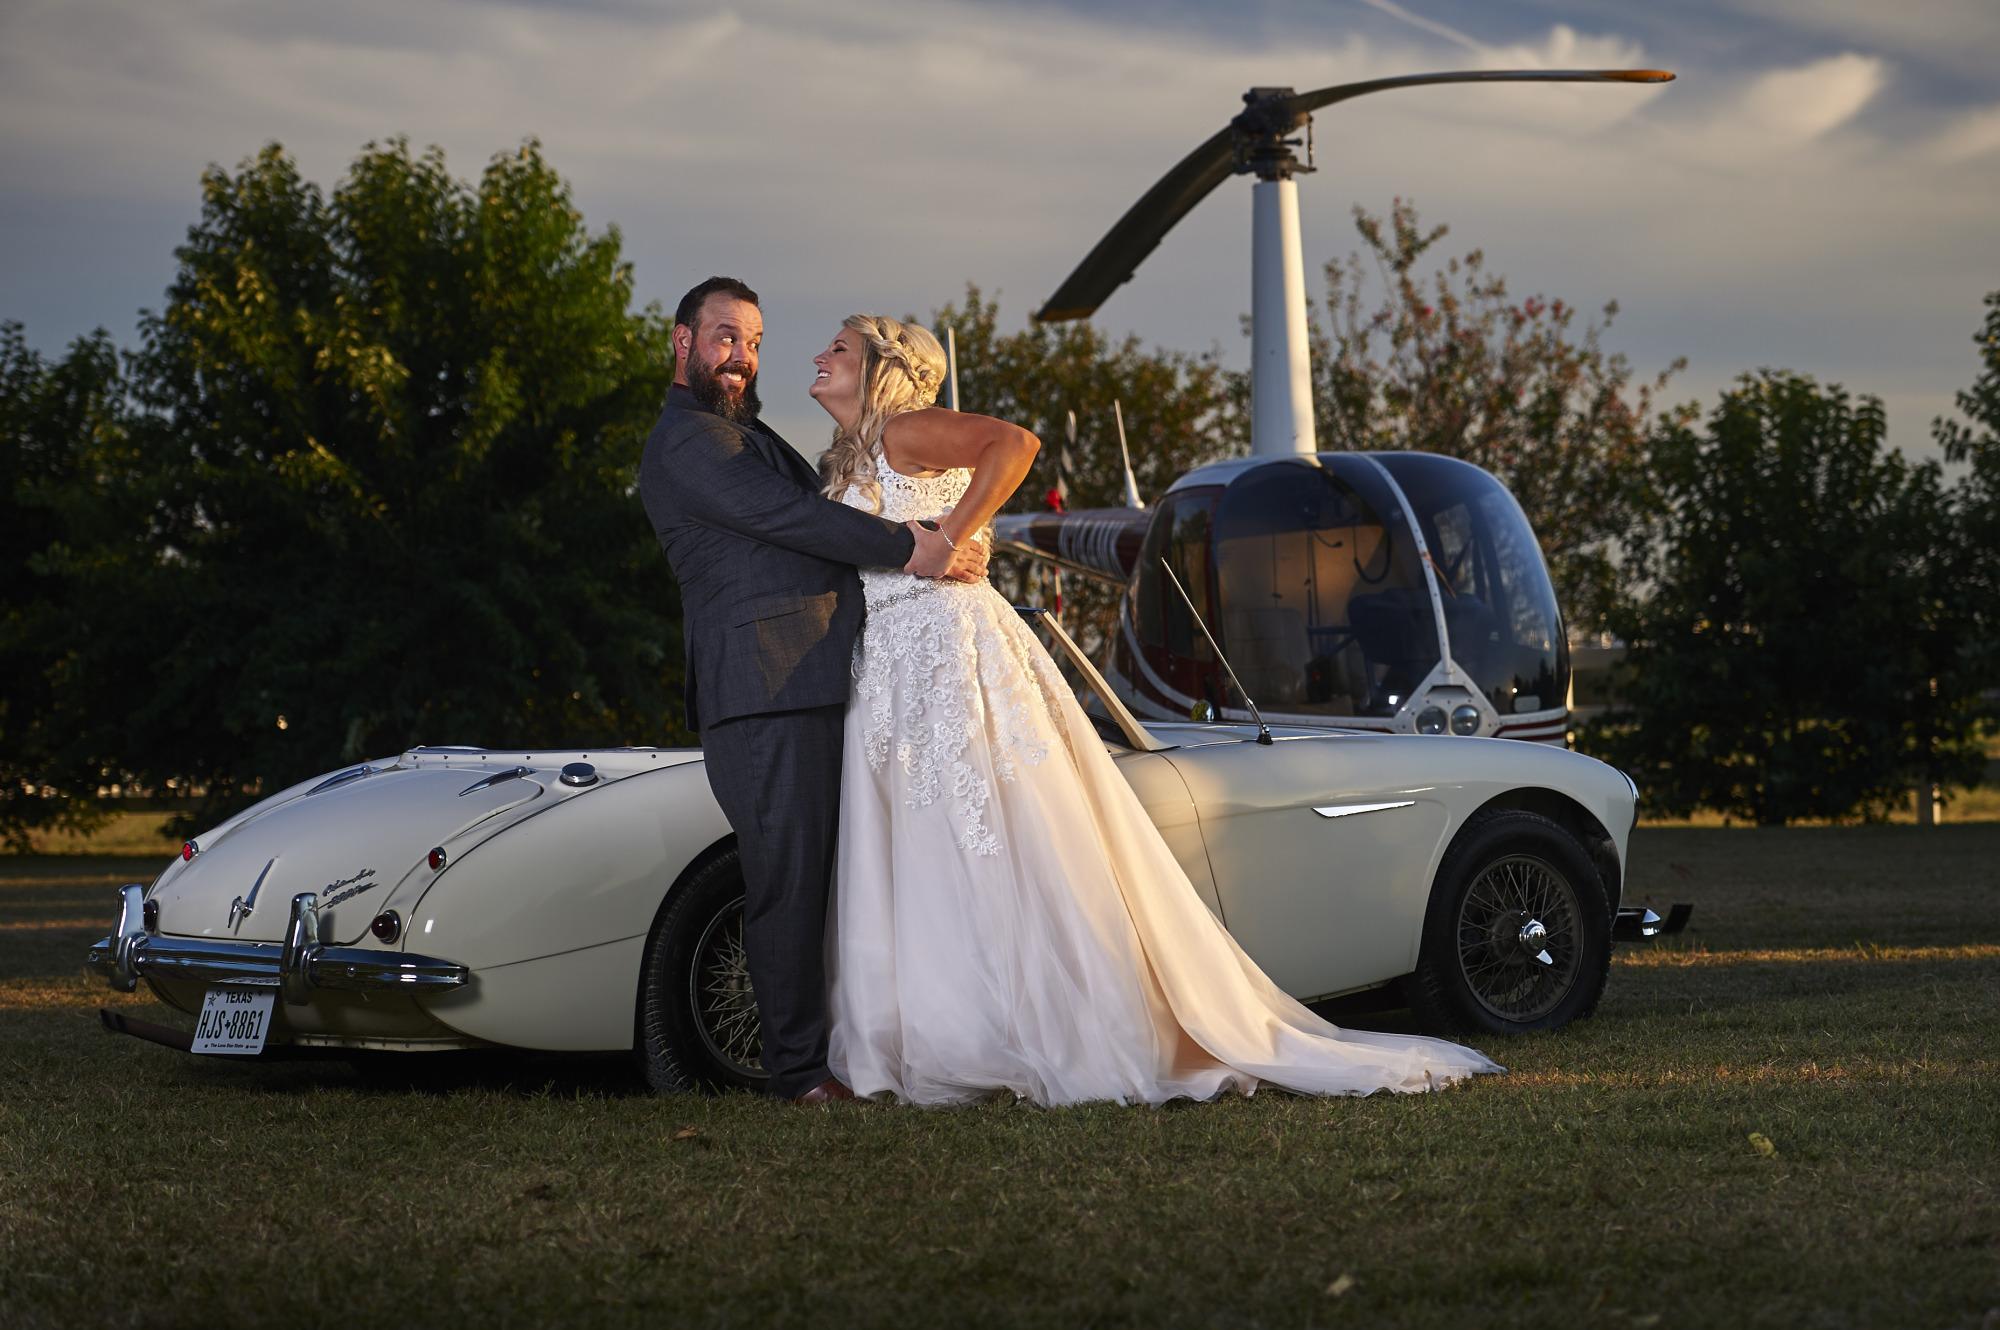 Taylor and Cody - Taylor Mansion and Crystal Ball Room - Taylor Texas - Wedding - 027